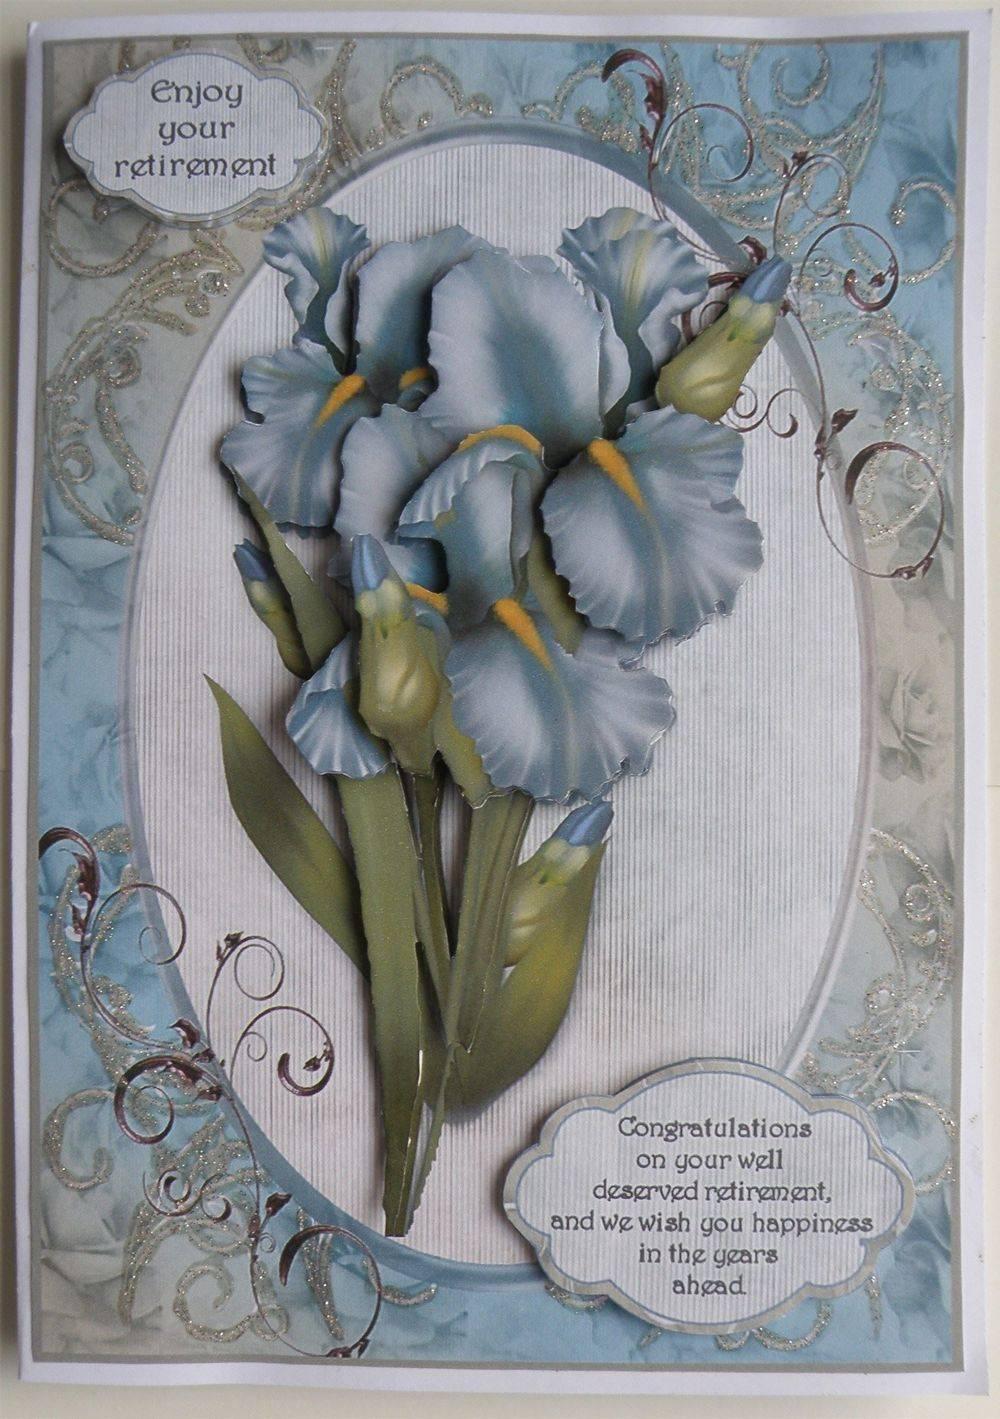 Blue Iris Retirement